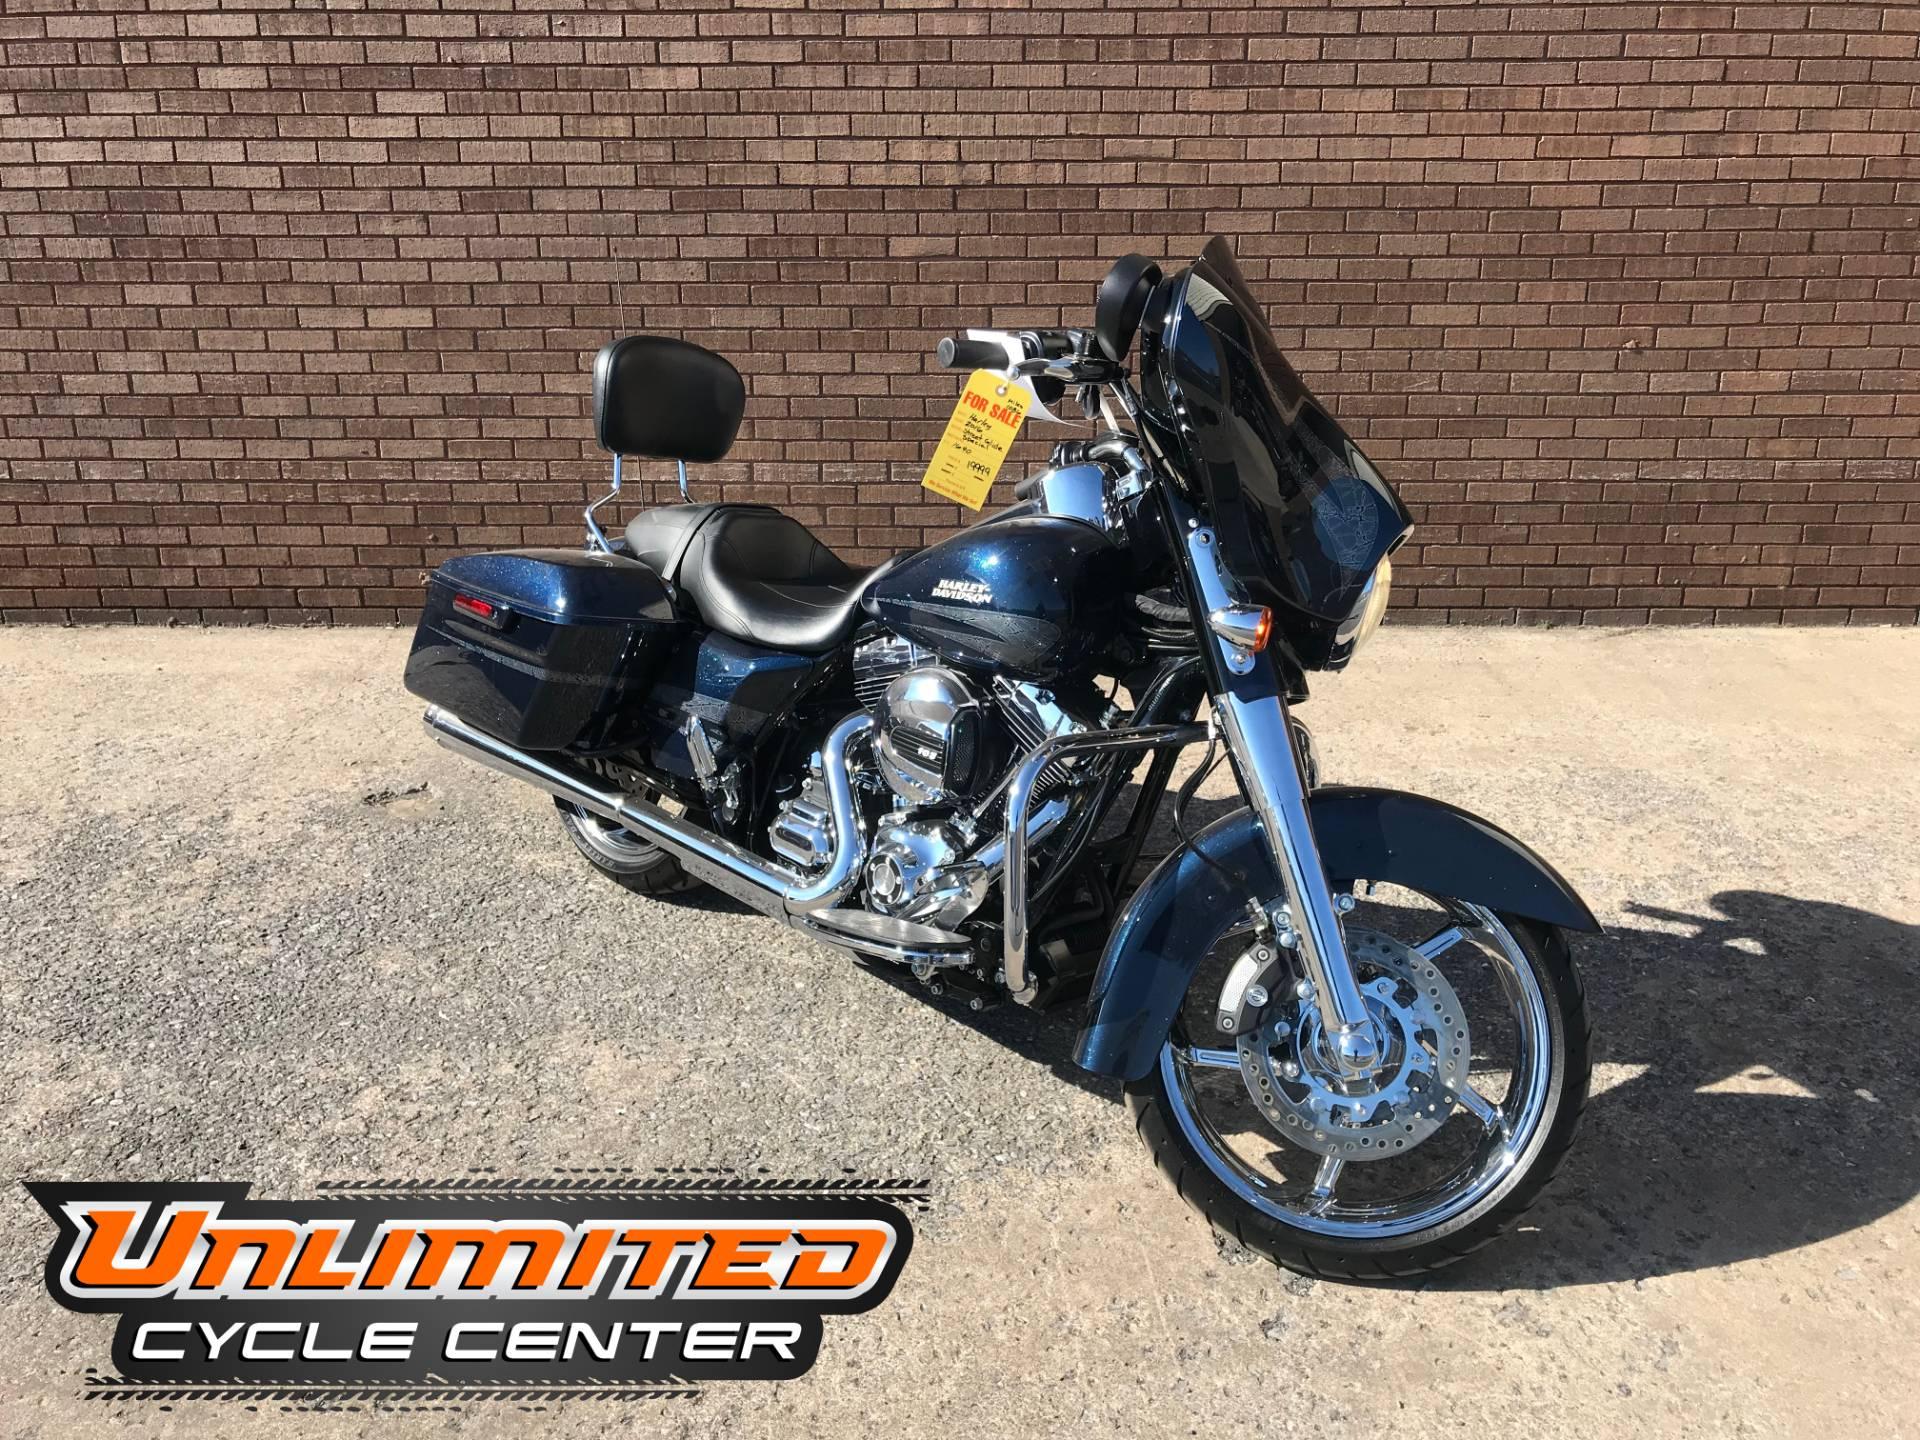 2016 Harley Davidson Street Glide Special In Tyrone Pennsylvania Photo 1